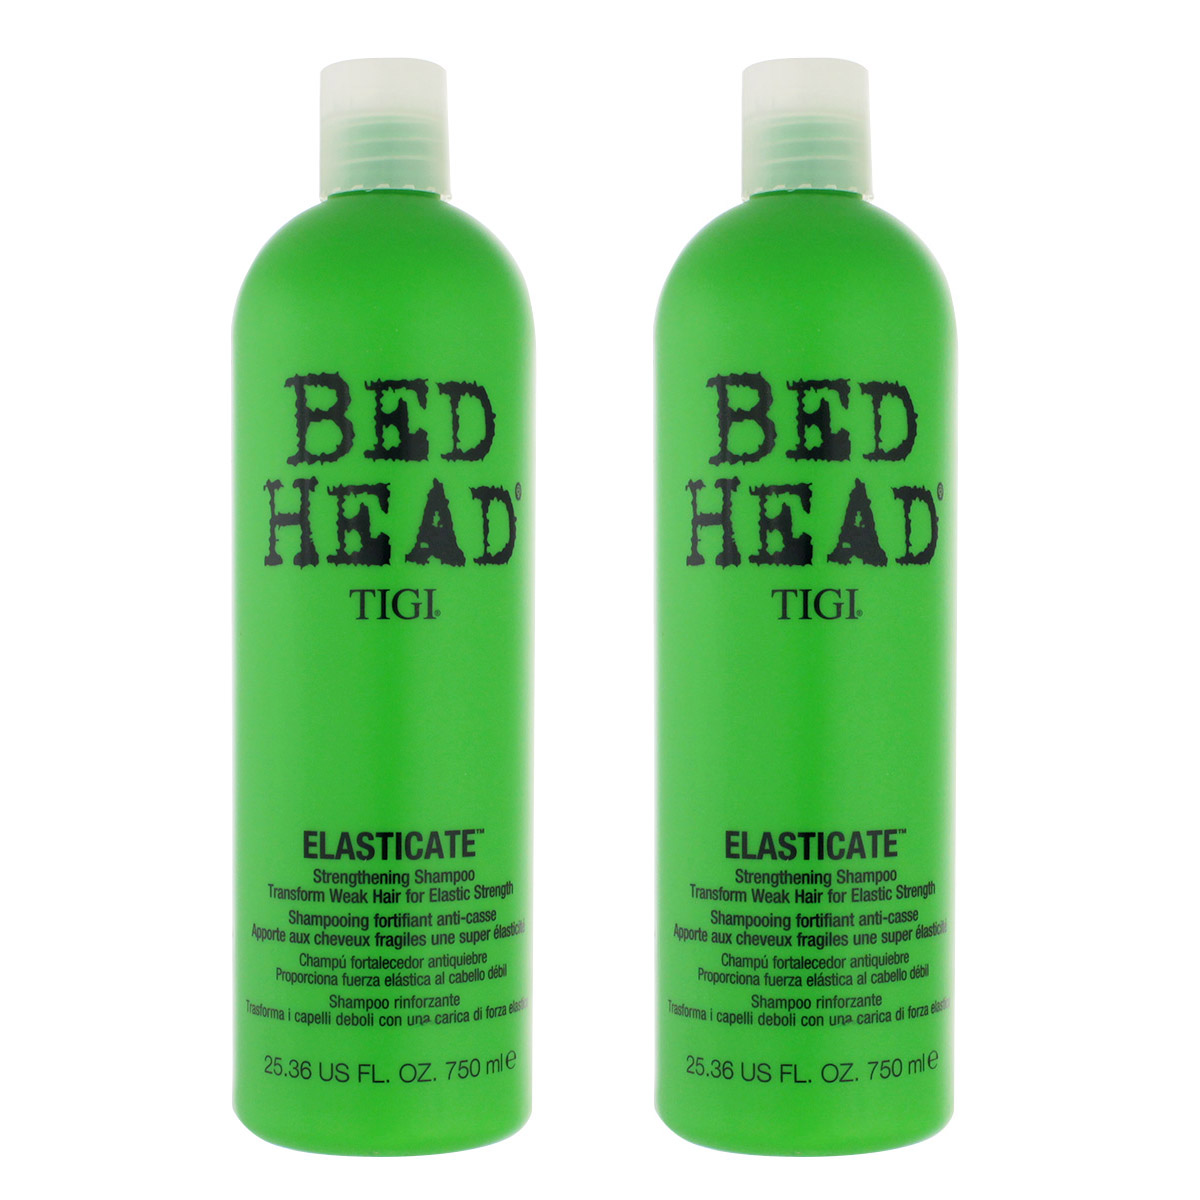 Tigi Bed Head Elasticate Strengthening Shampoo 2 x 750 ml